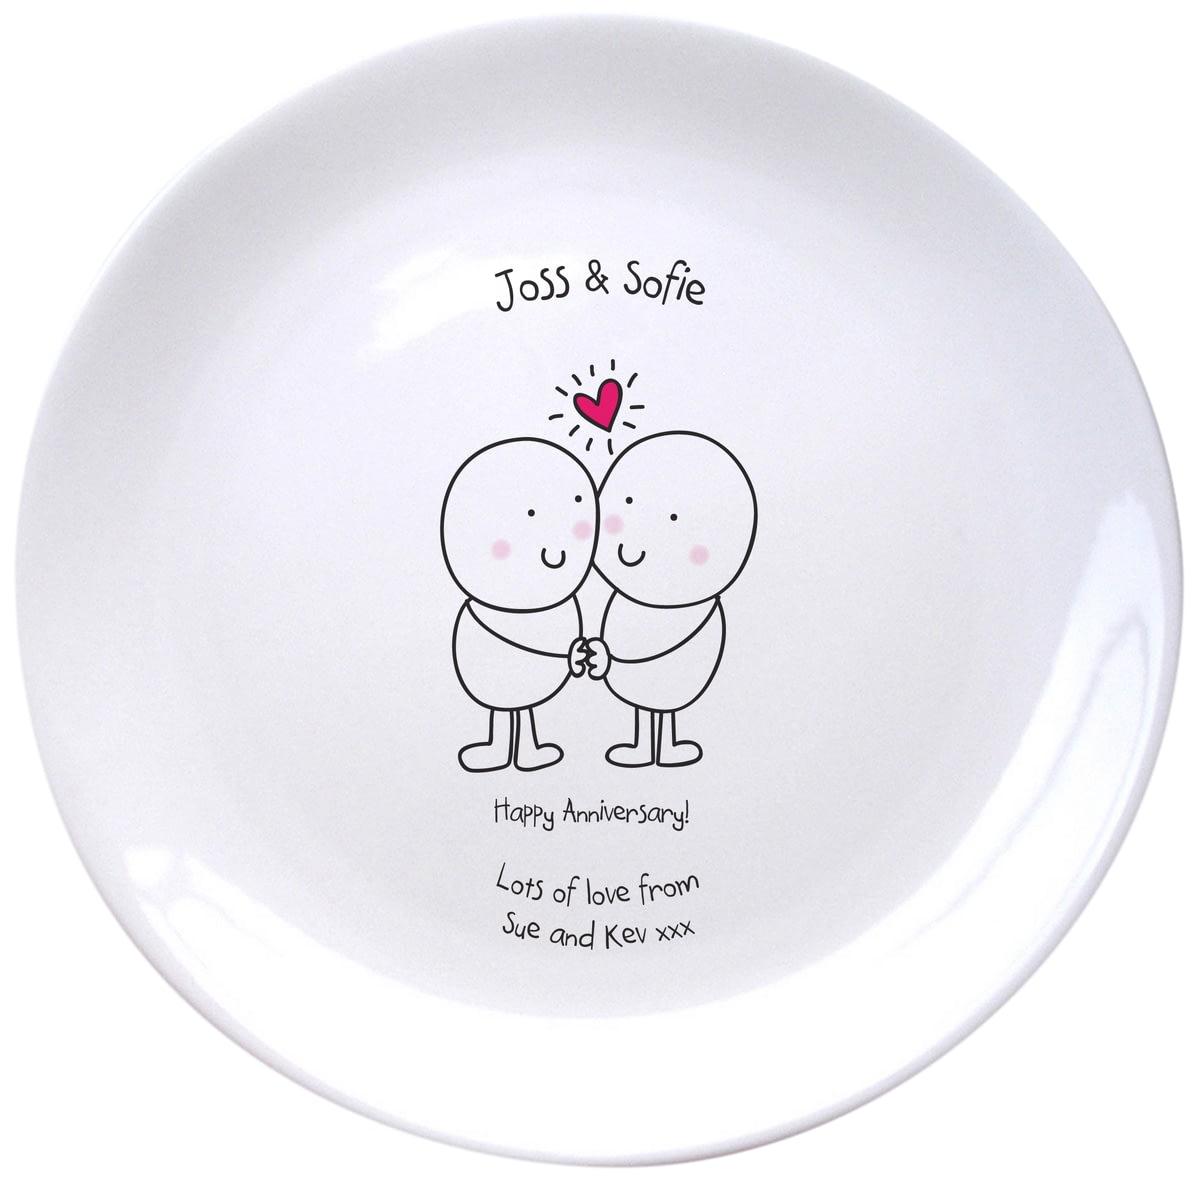 20th Anniversary Traditional Gift: Personalised Chilli & Bubble's Anniversary Ceramic Plate